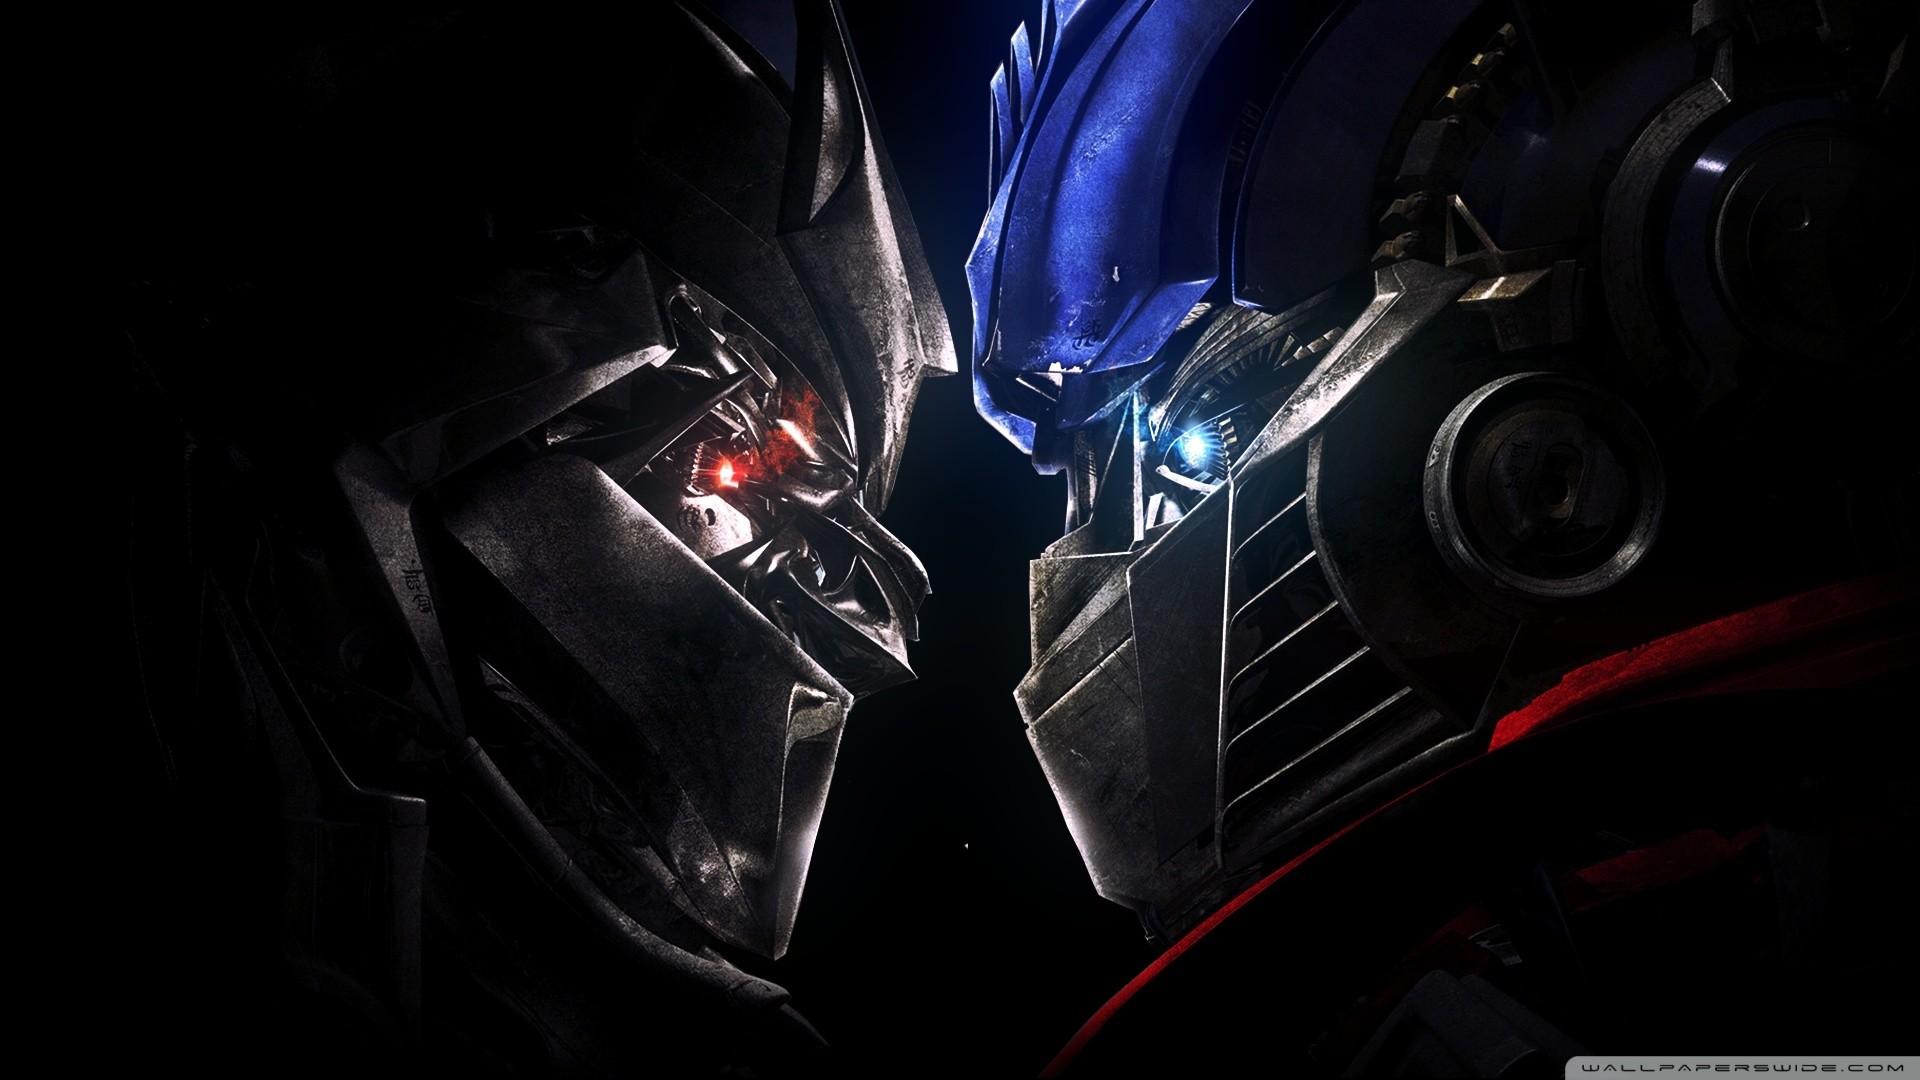 transformers hd wallpaper ·①